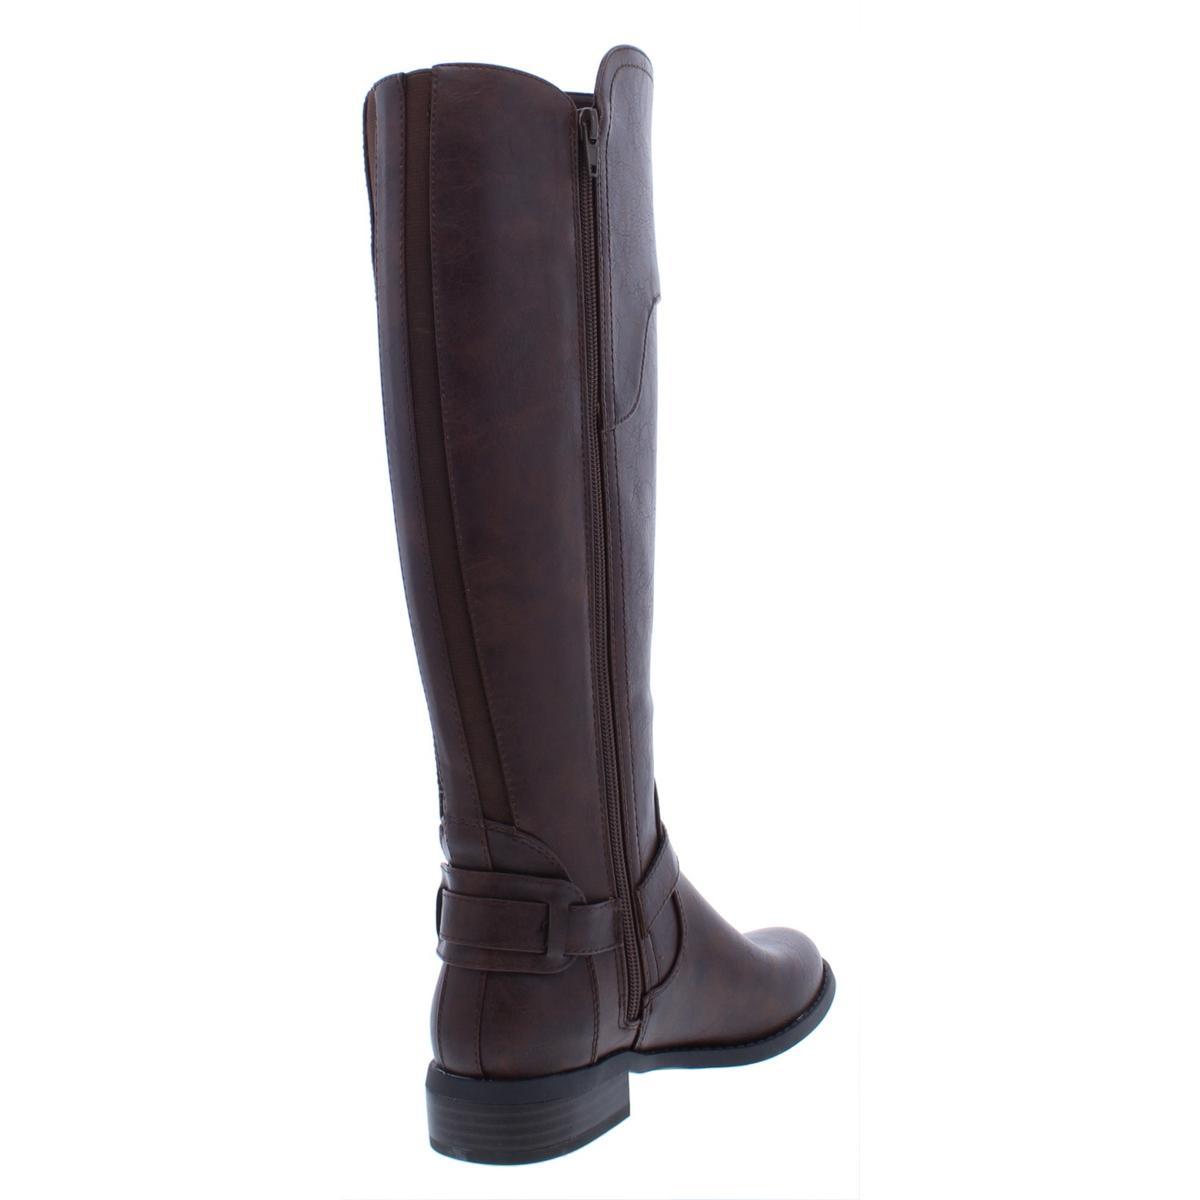 4a8ec678676c G by GUESS Harson Wide Calf Flat Knee-high BOOTS Dark Brown 5.5 US ...